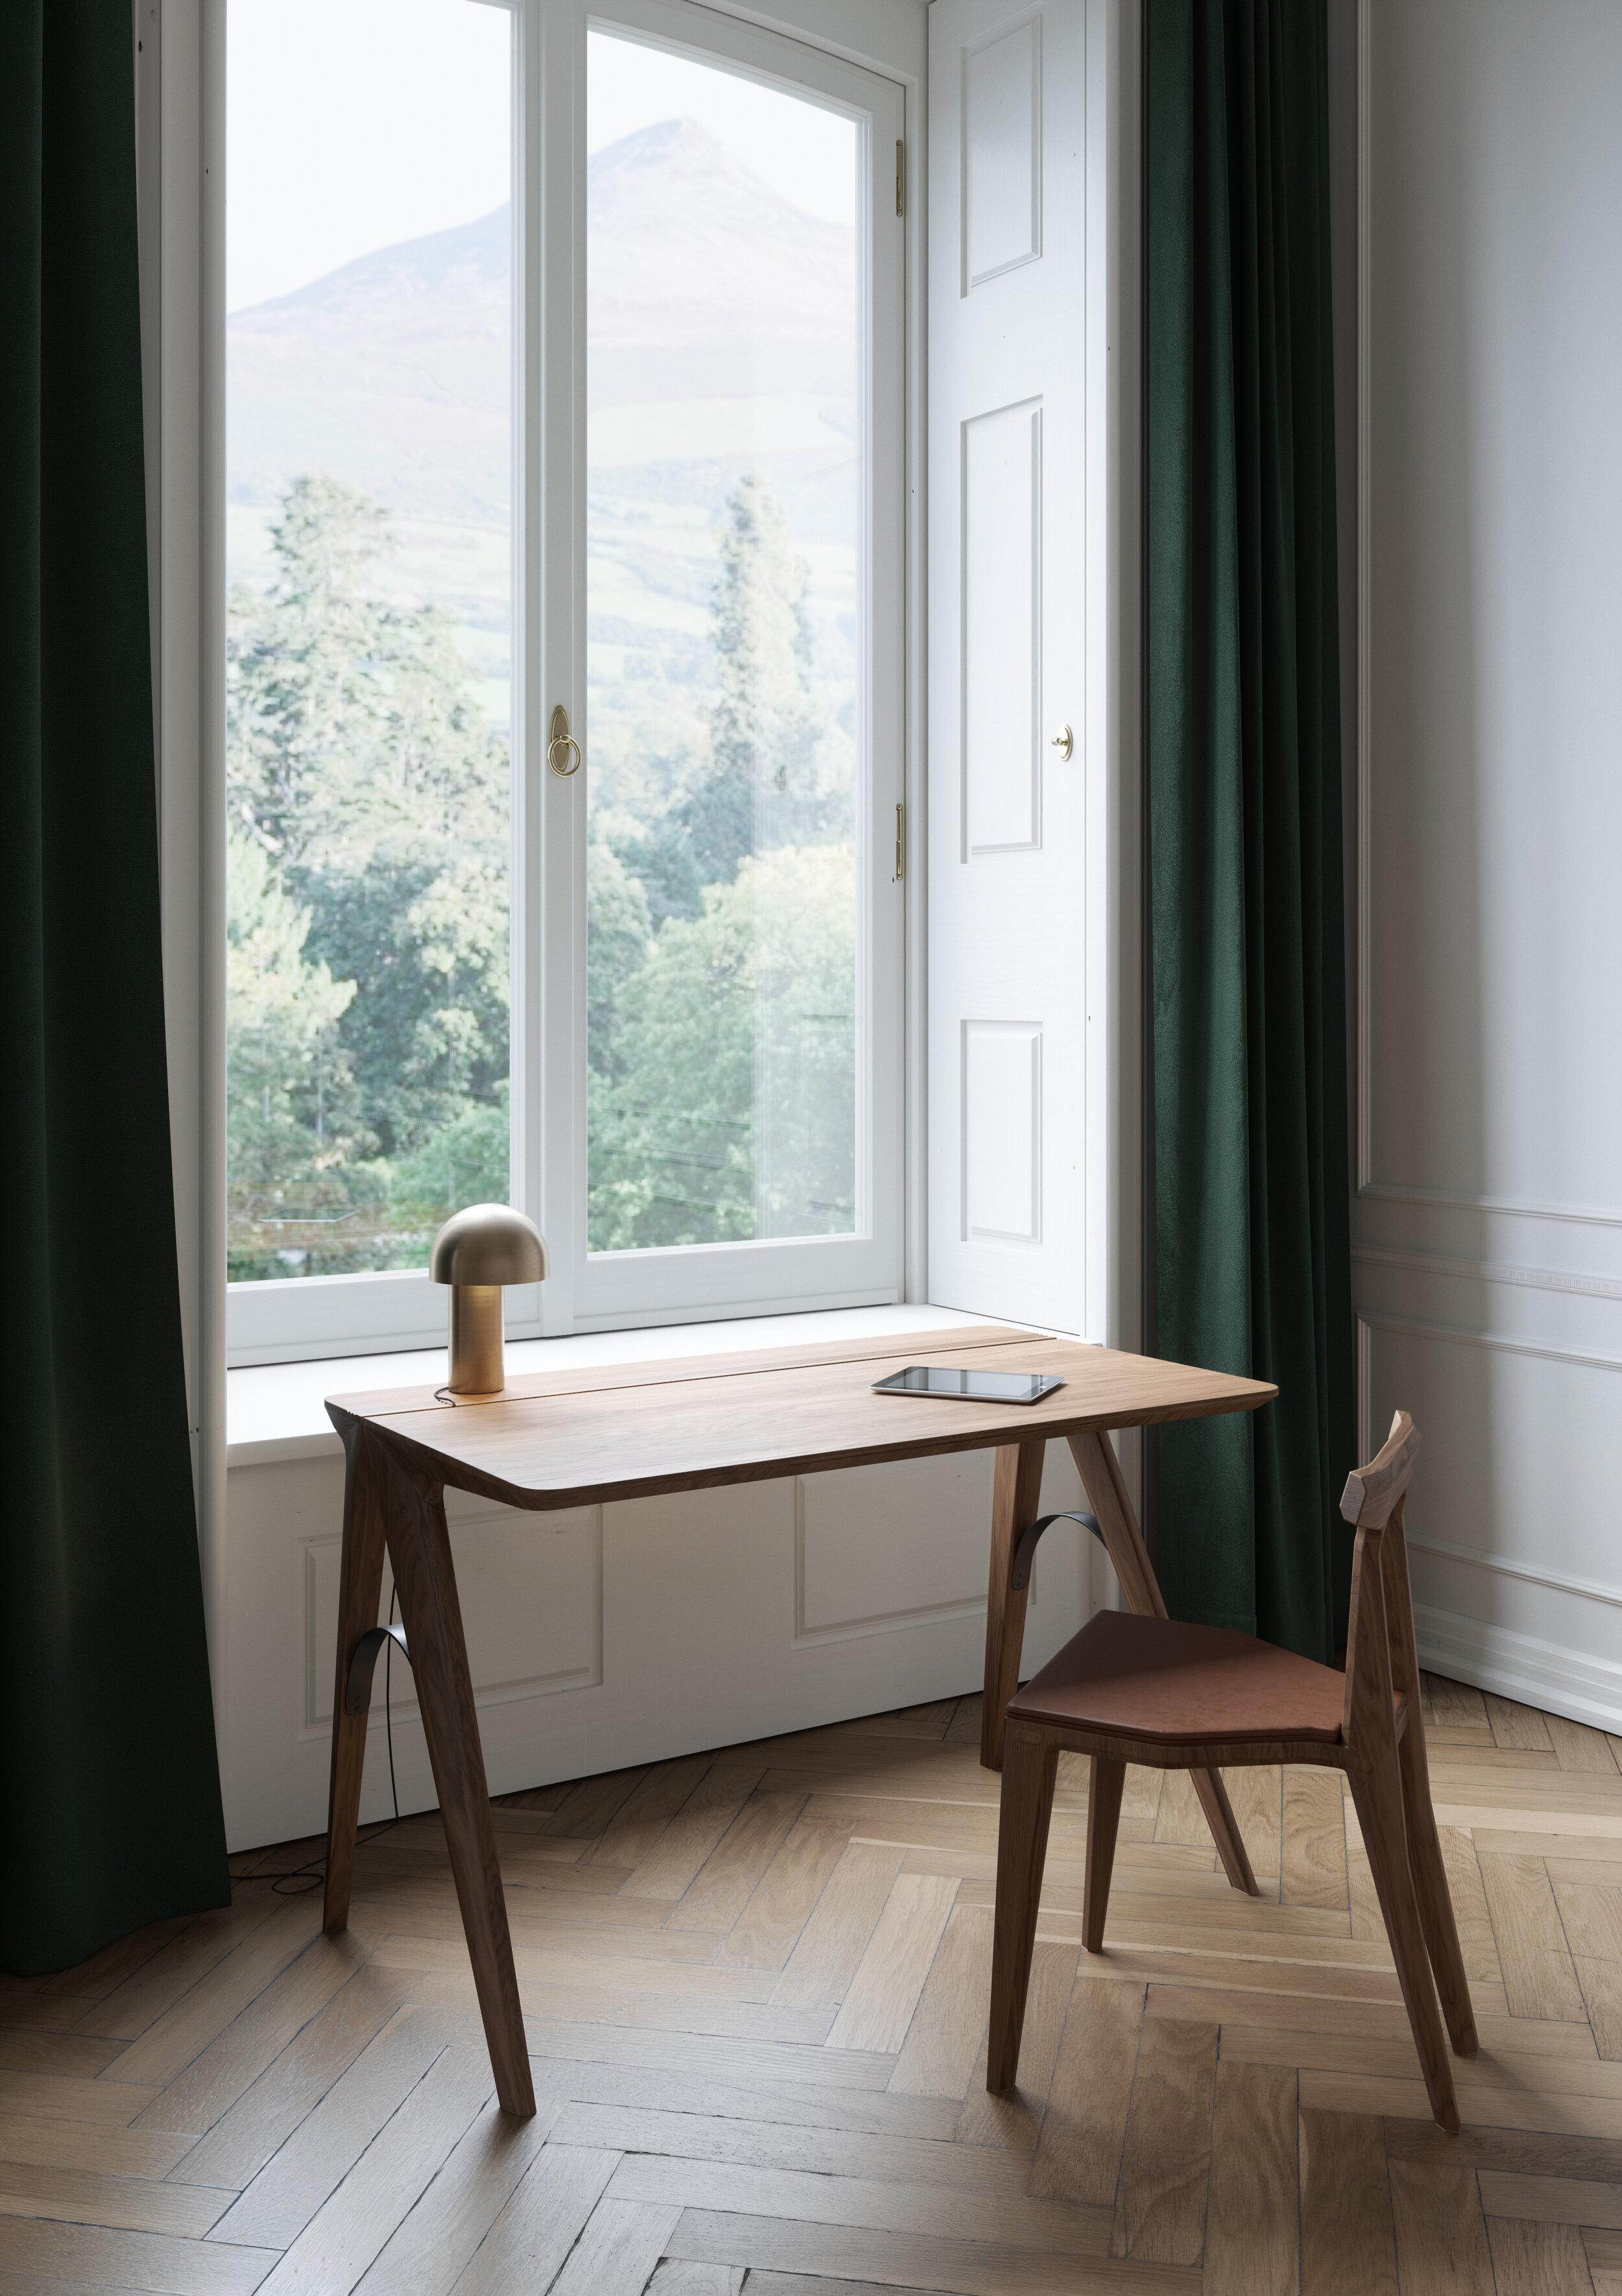 3 Minimalist Desks To Increase Your Creativity